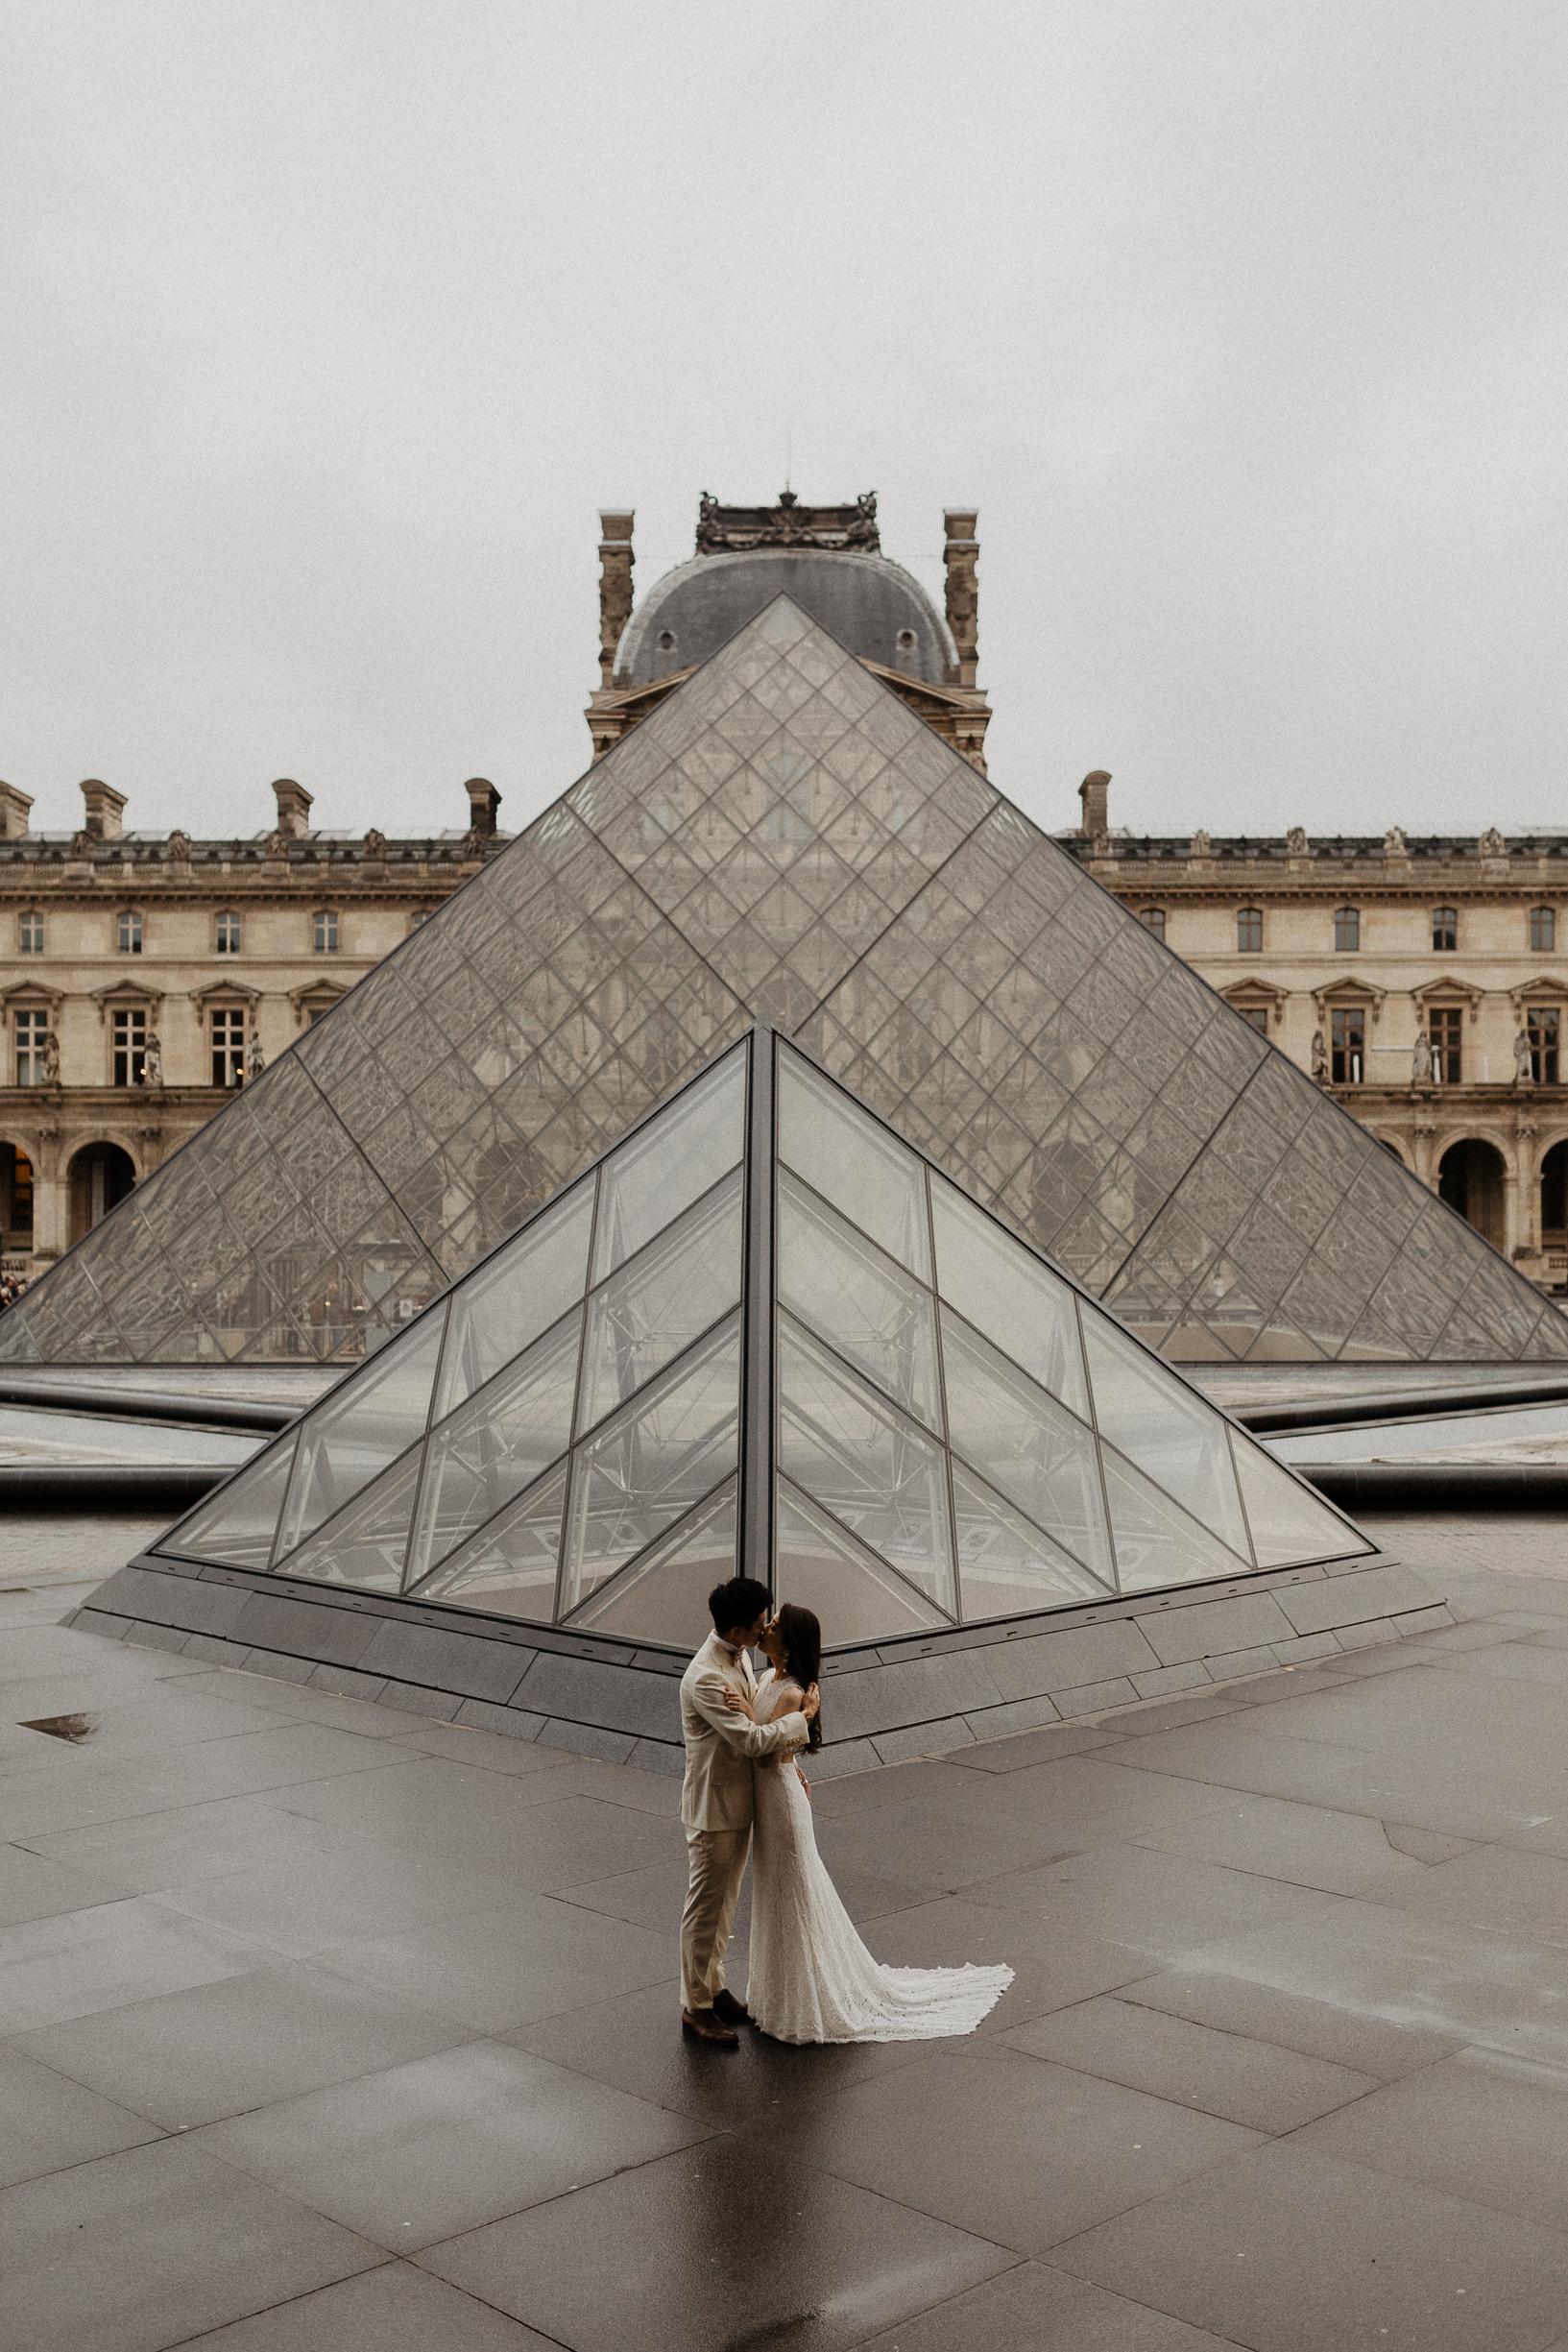 louvre pyramide paris couple wedding photo